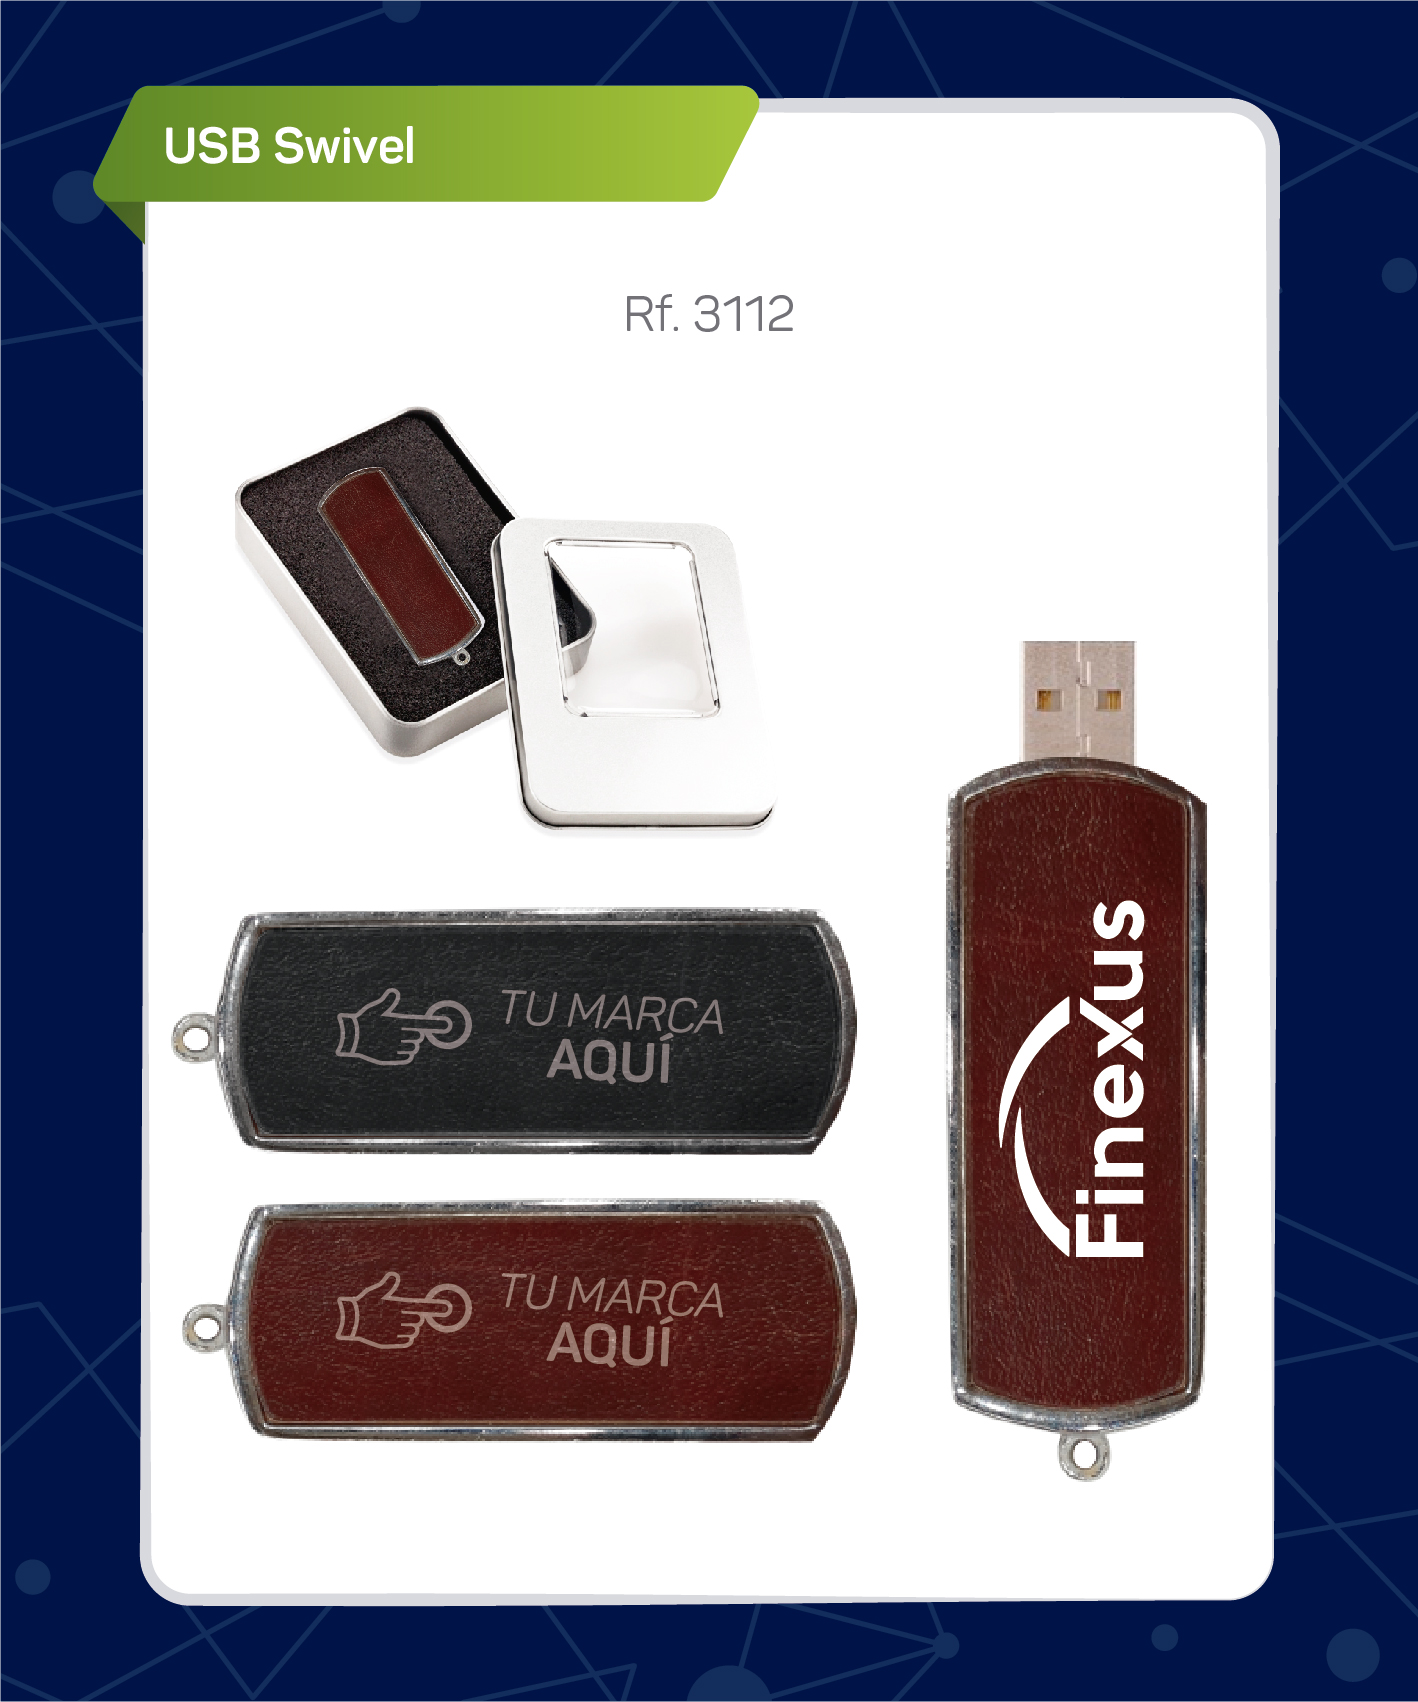 USB SWIVEL